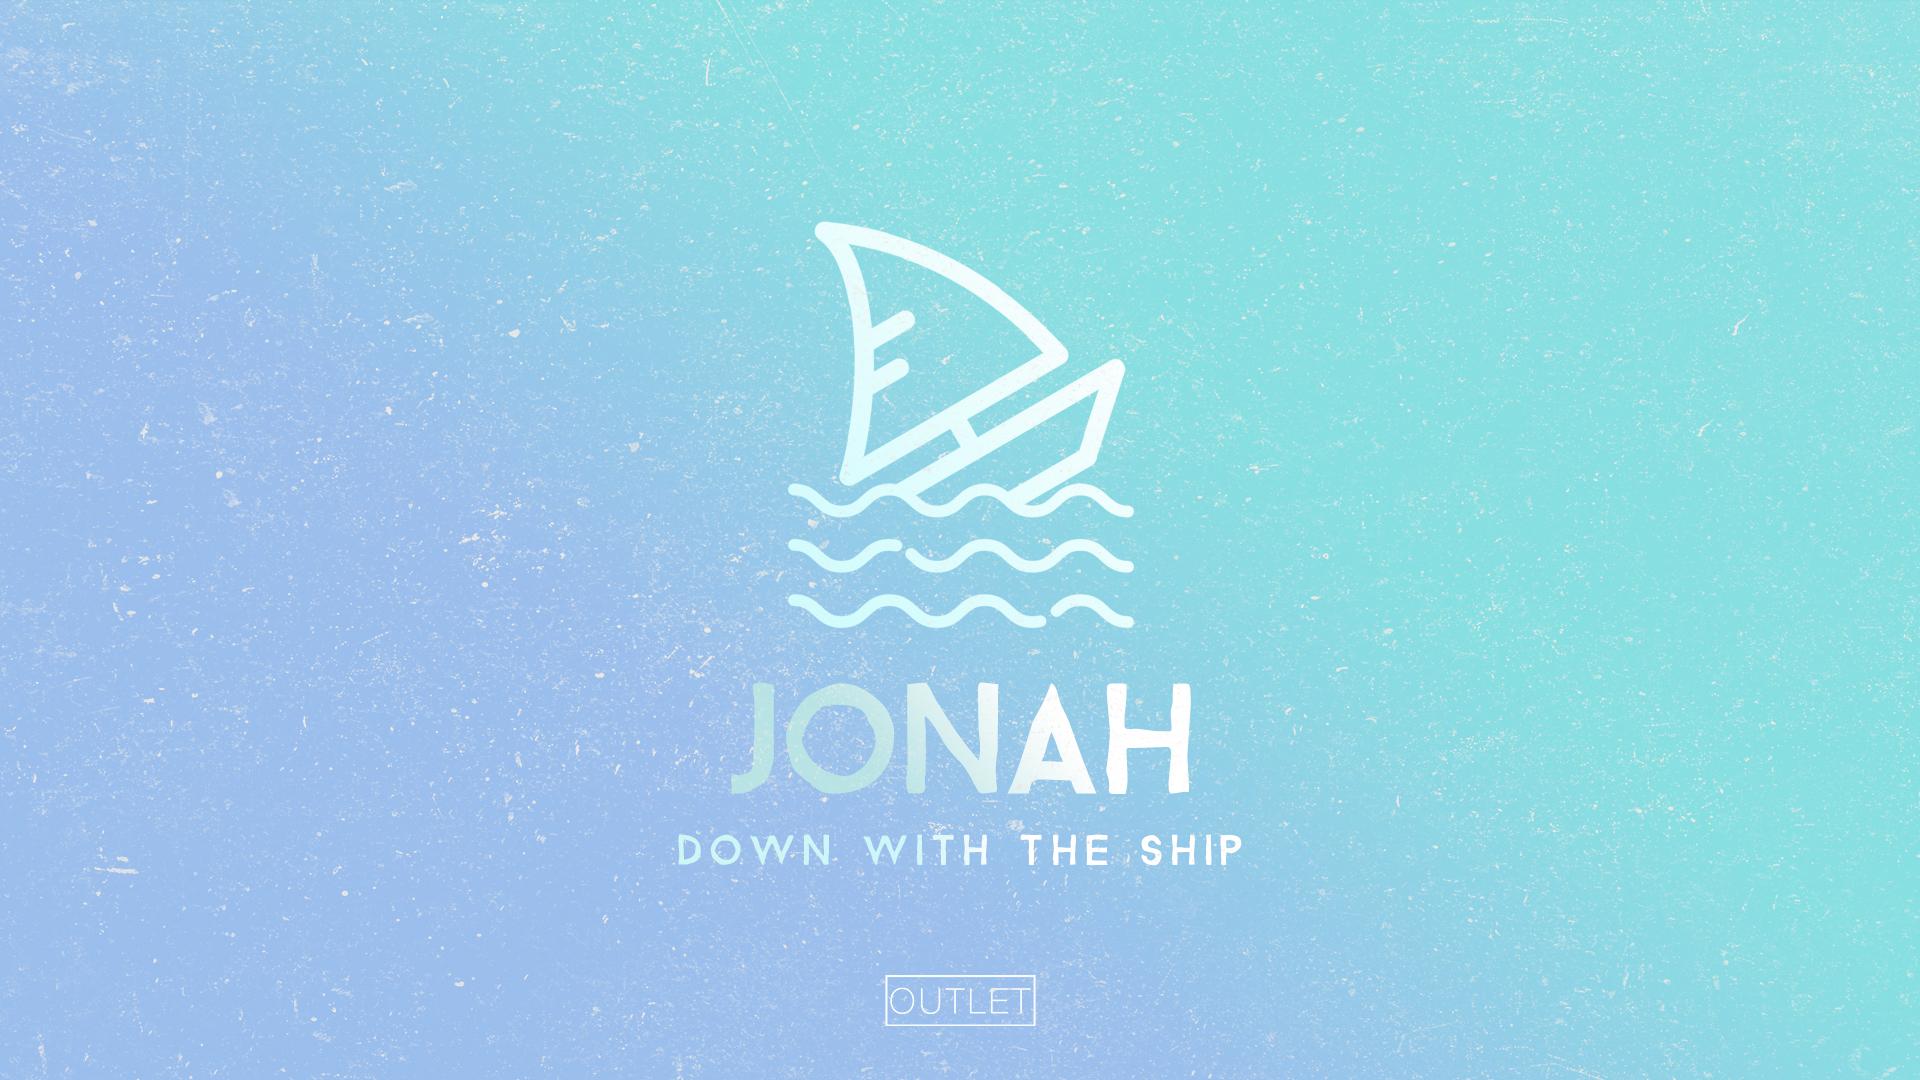 Jonah - Down with the ship.jpg